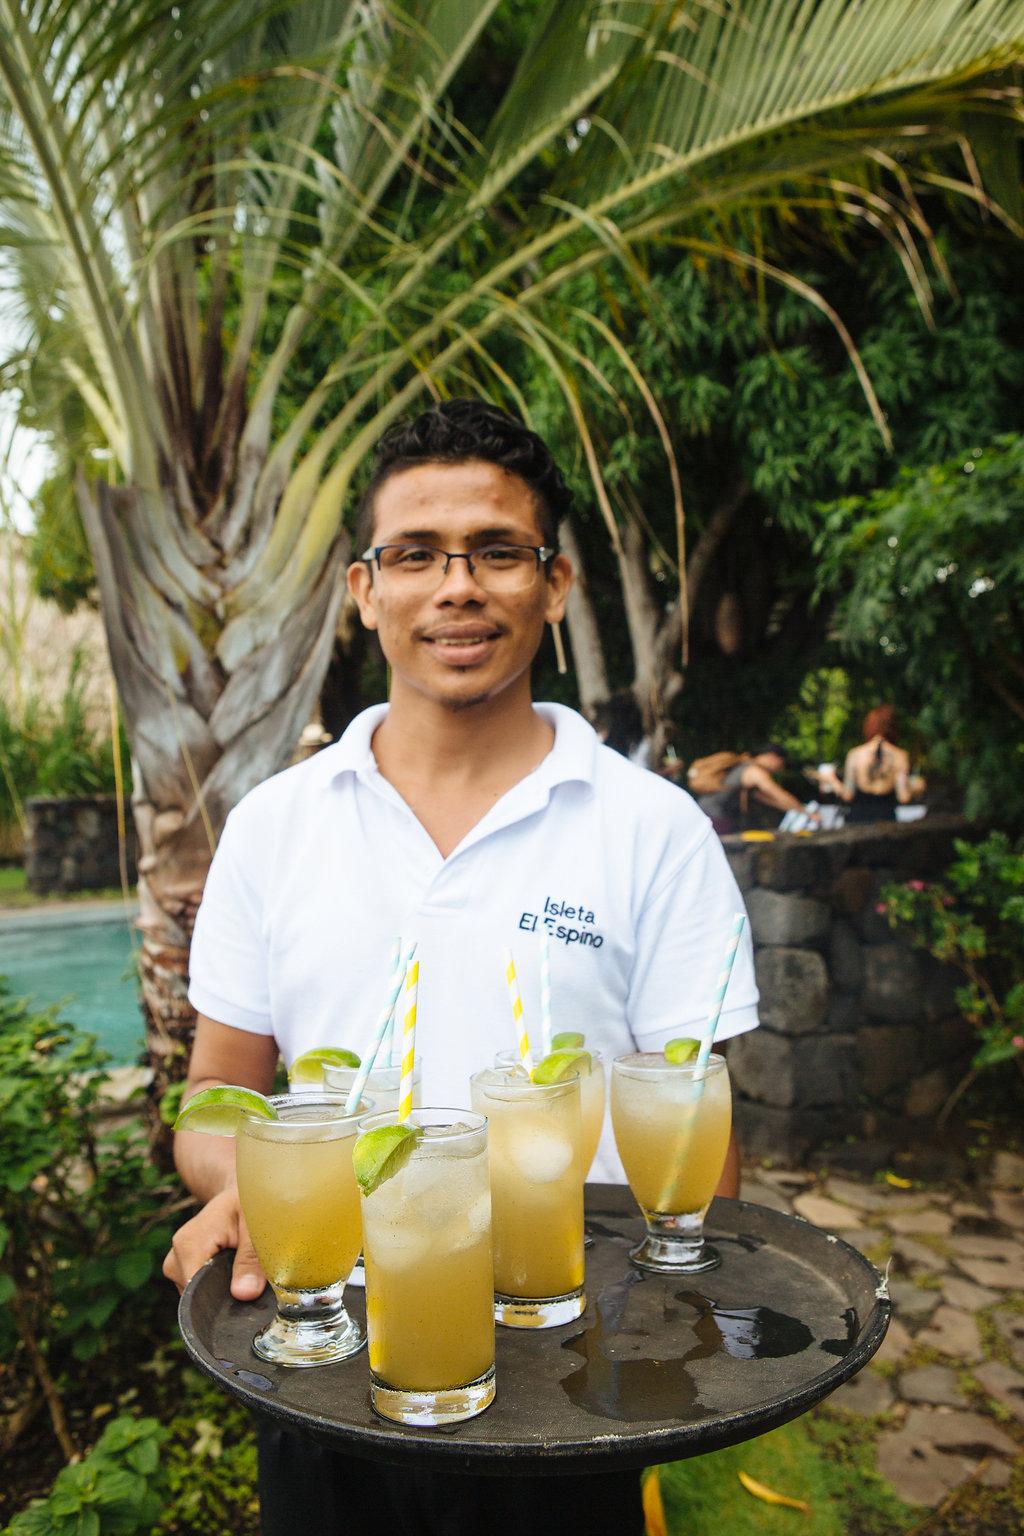 nicaragua-islets-granada-lake-isleta-el-espino-drinks.jpg